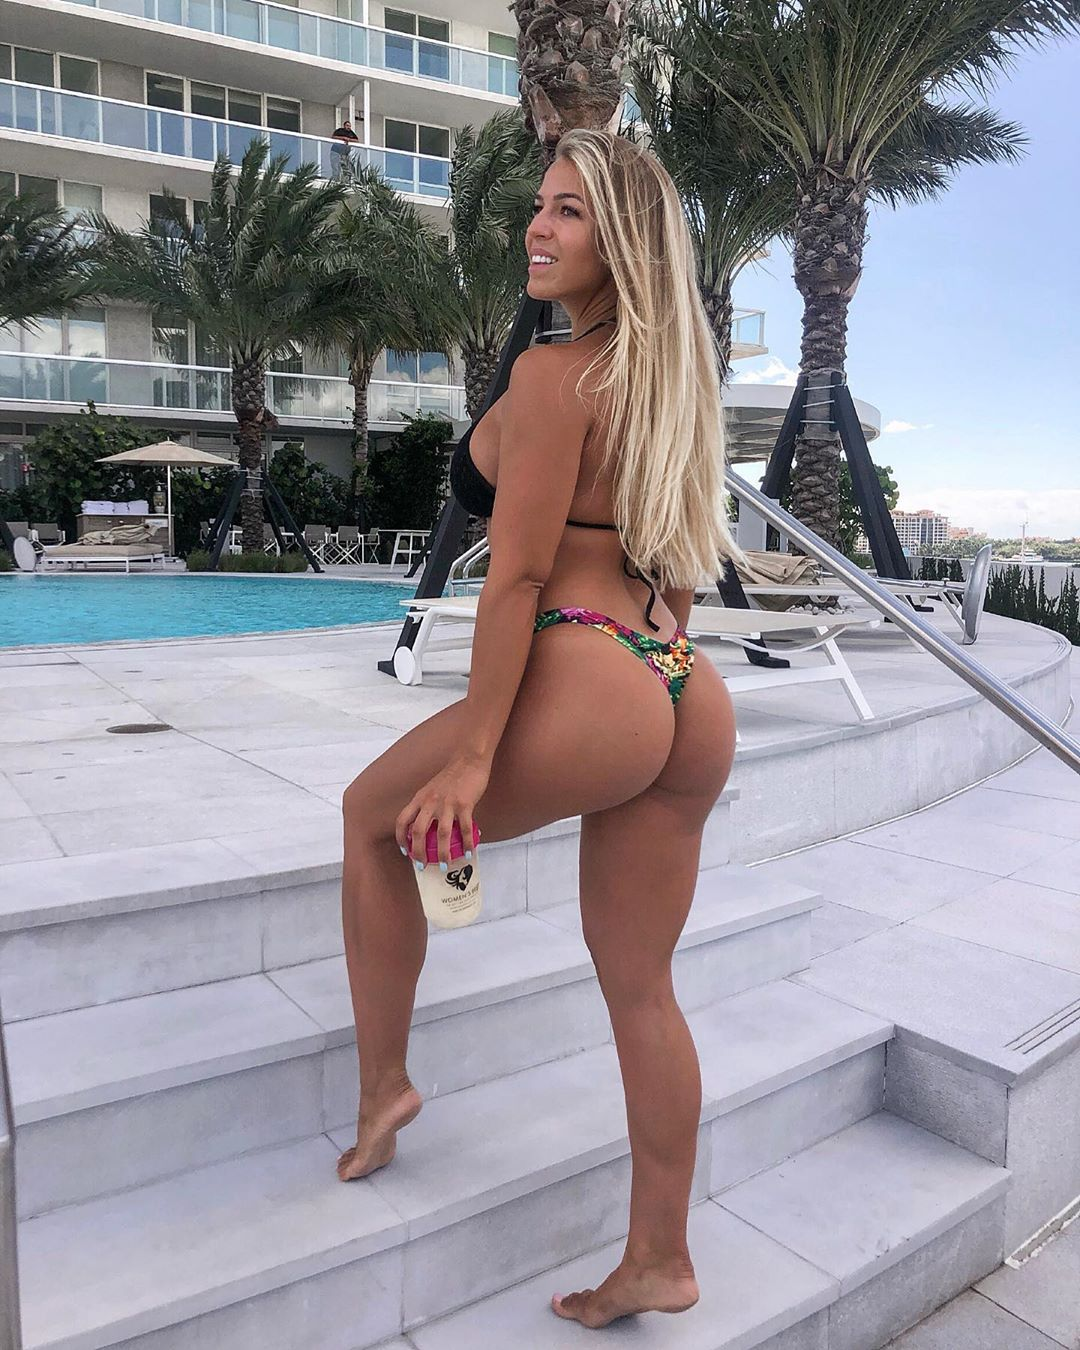 Michelle Bieri